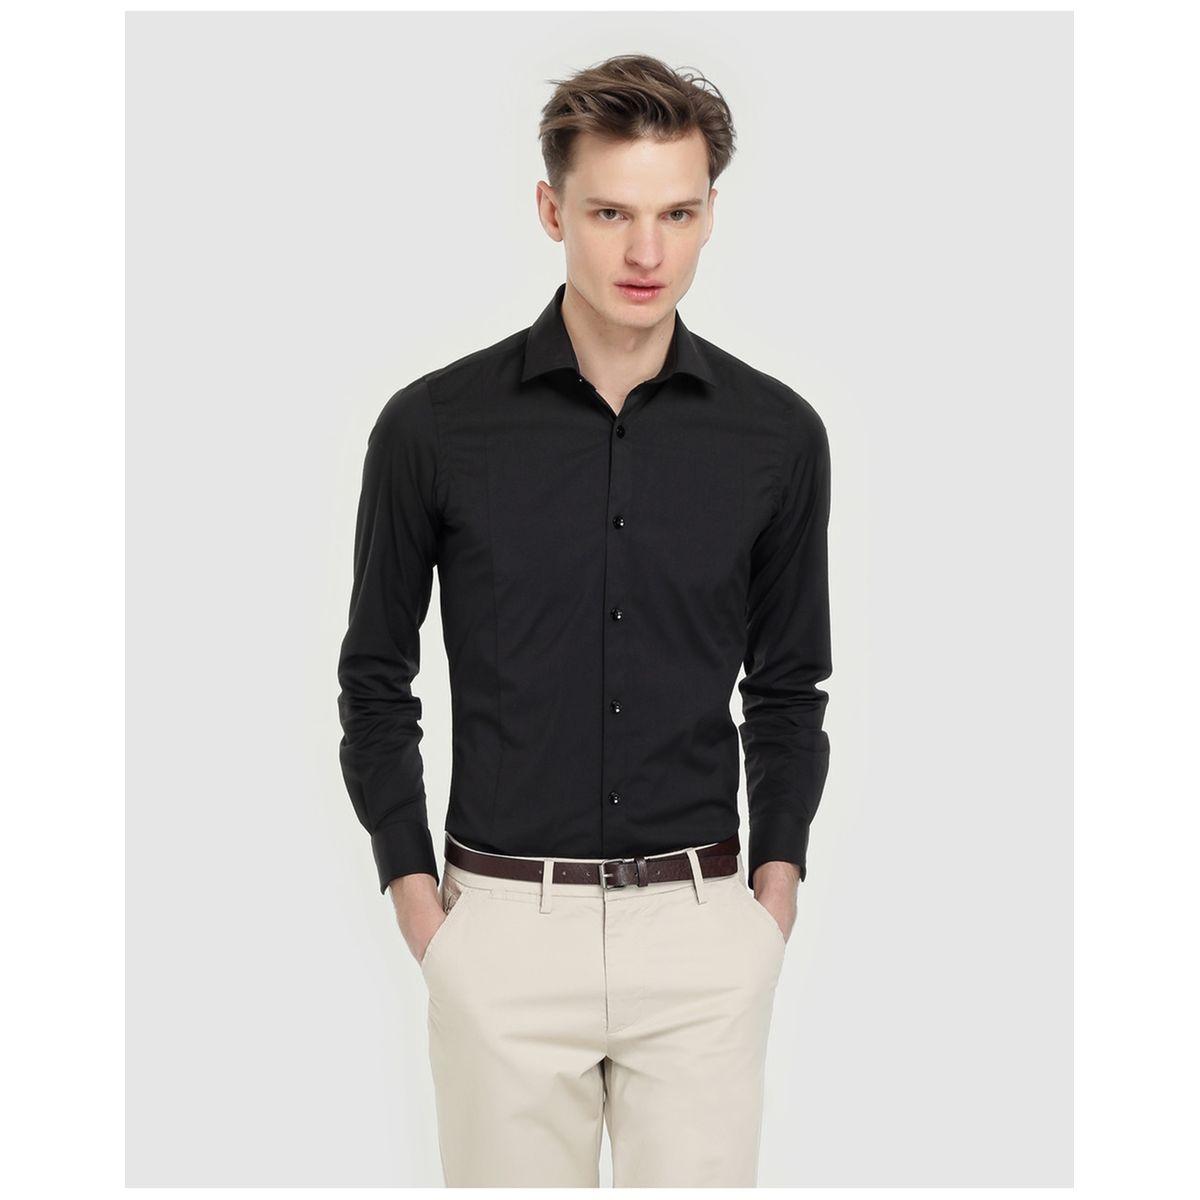 Chemise habillée slim  unie